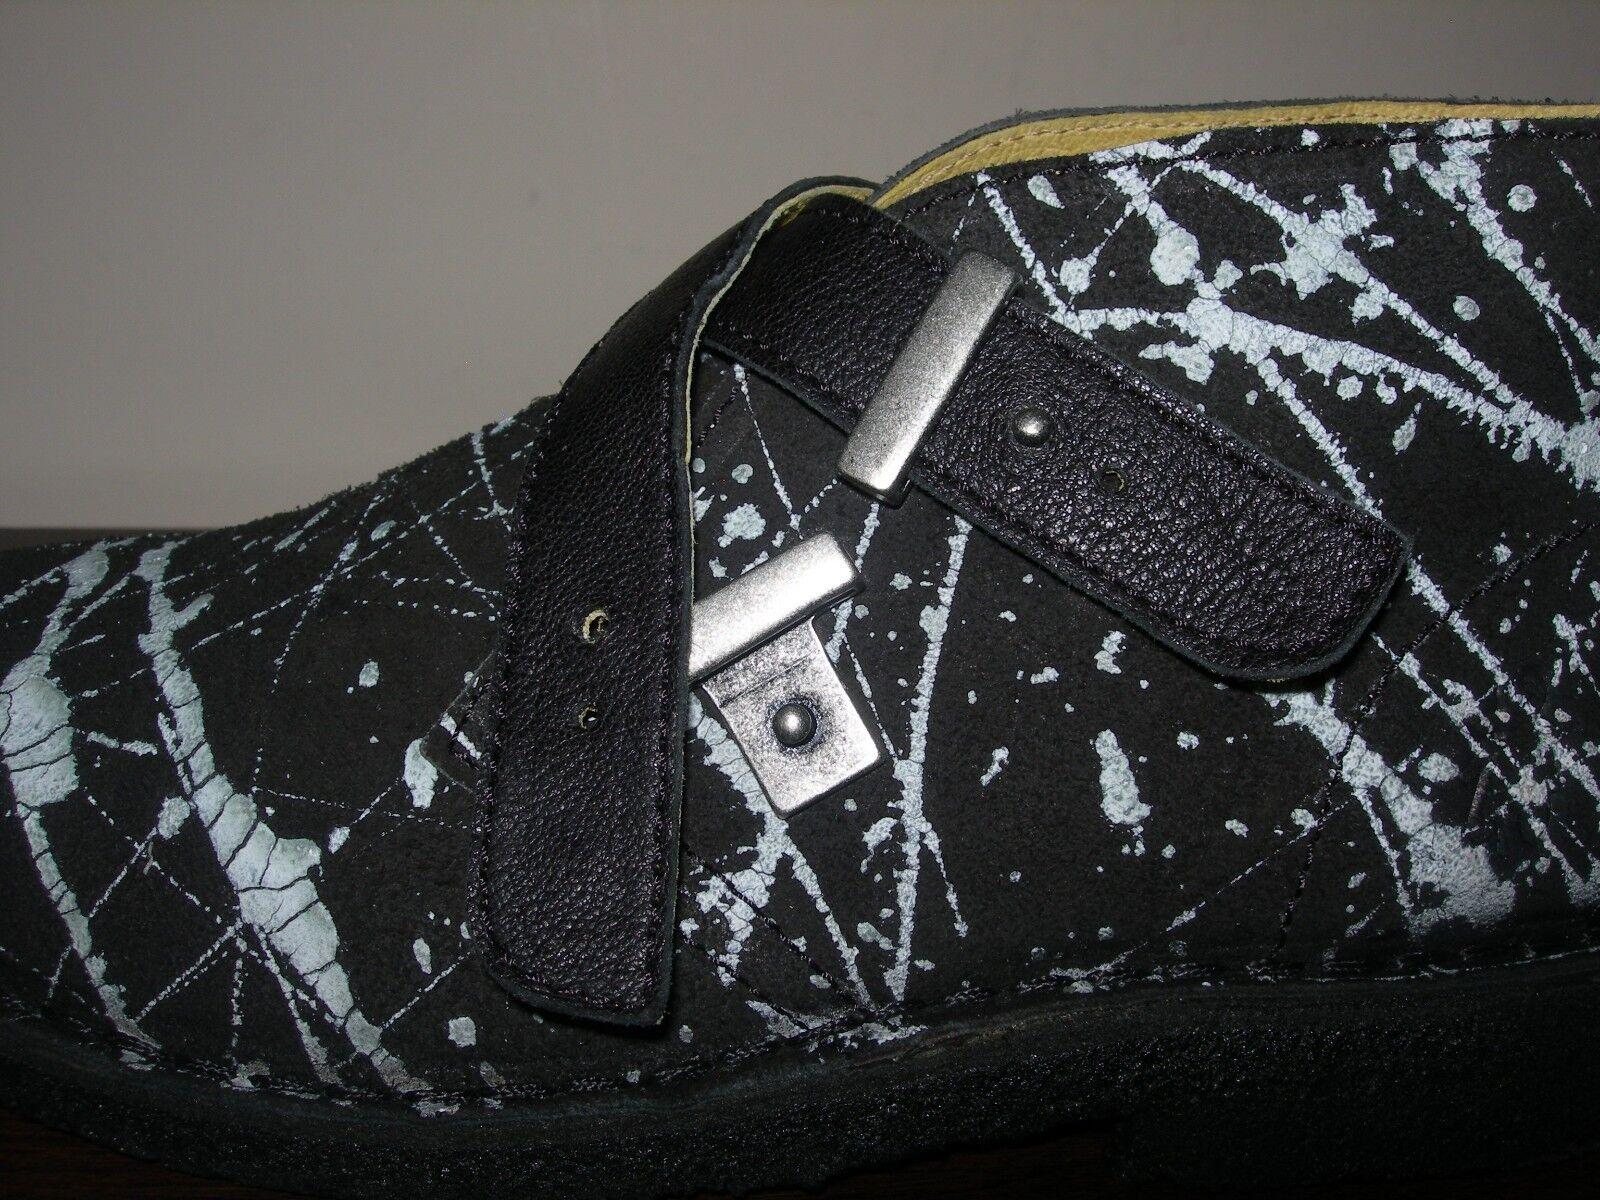 Fly London Para Hombre Y Mujer Unisex Desierto UK Tobillo botas Negro Gamuza EU 40 UK Desierto 6.5 e52408